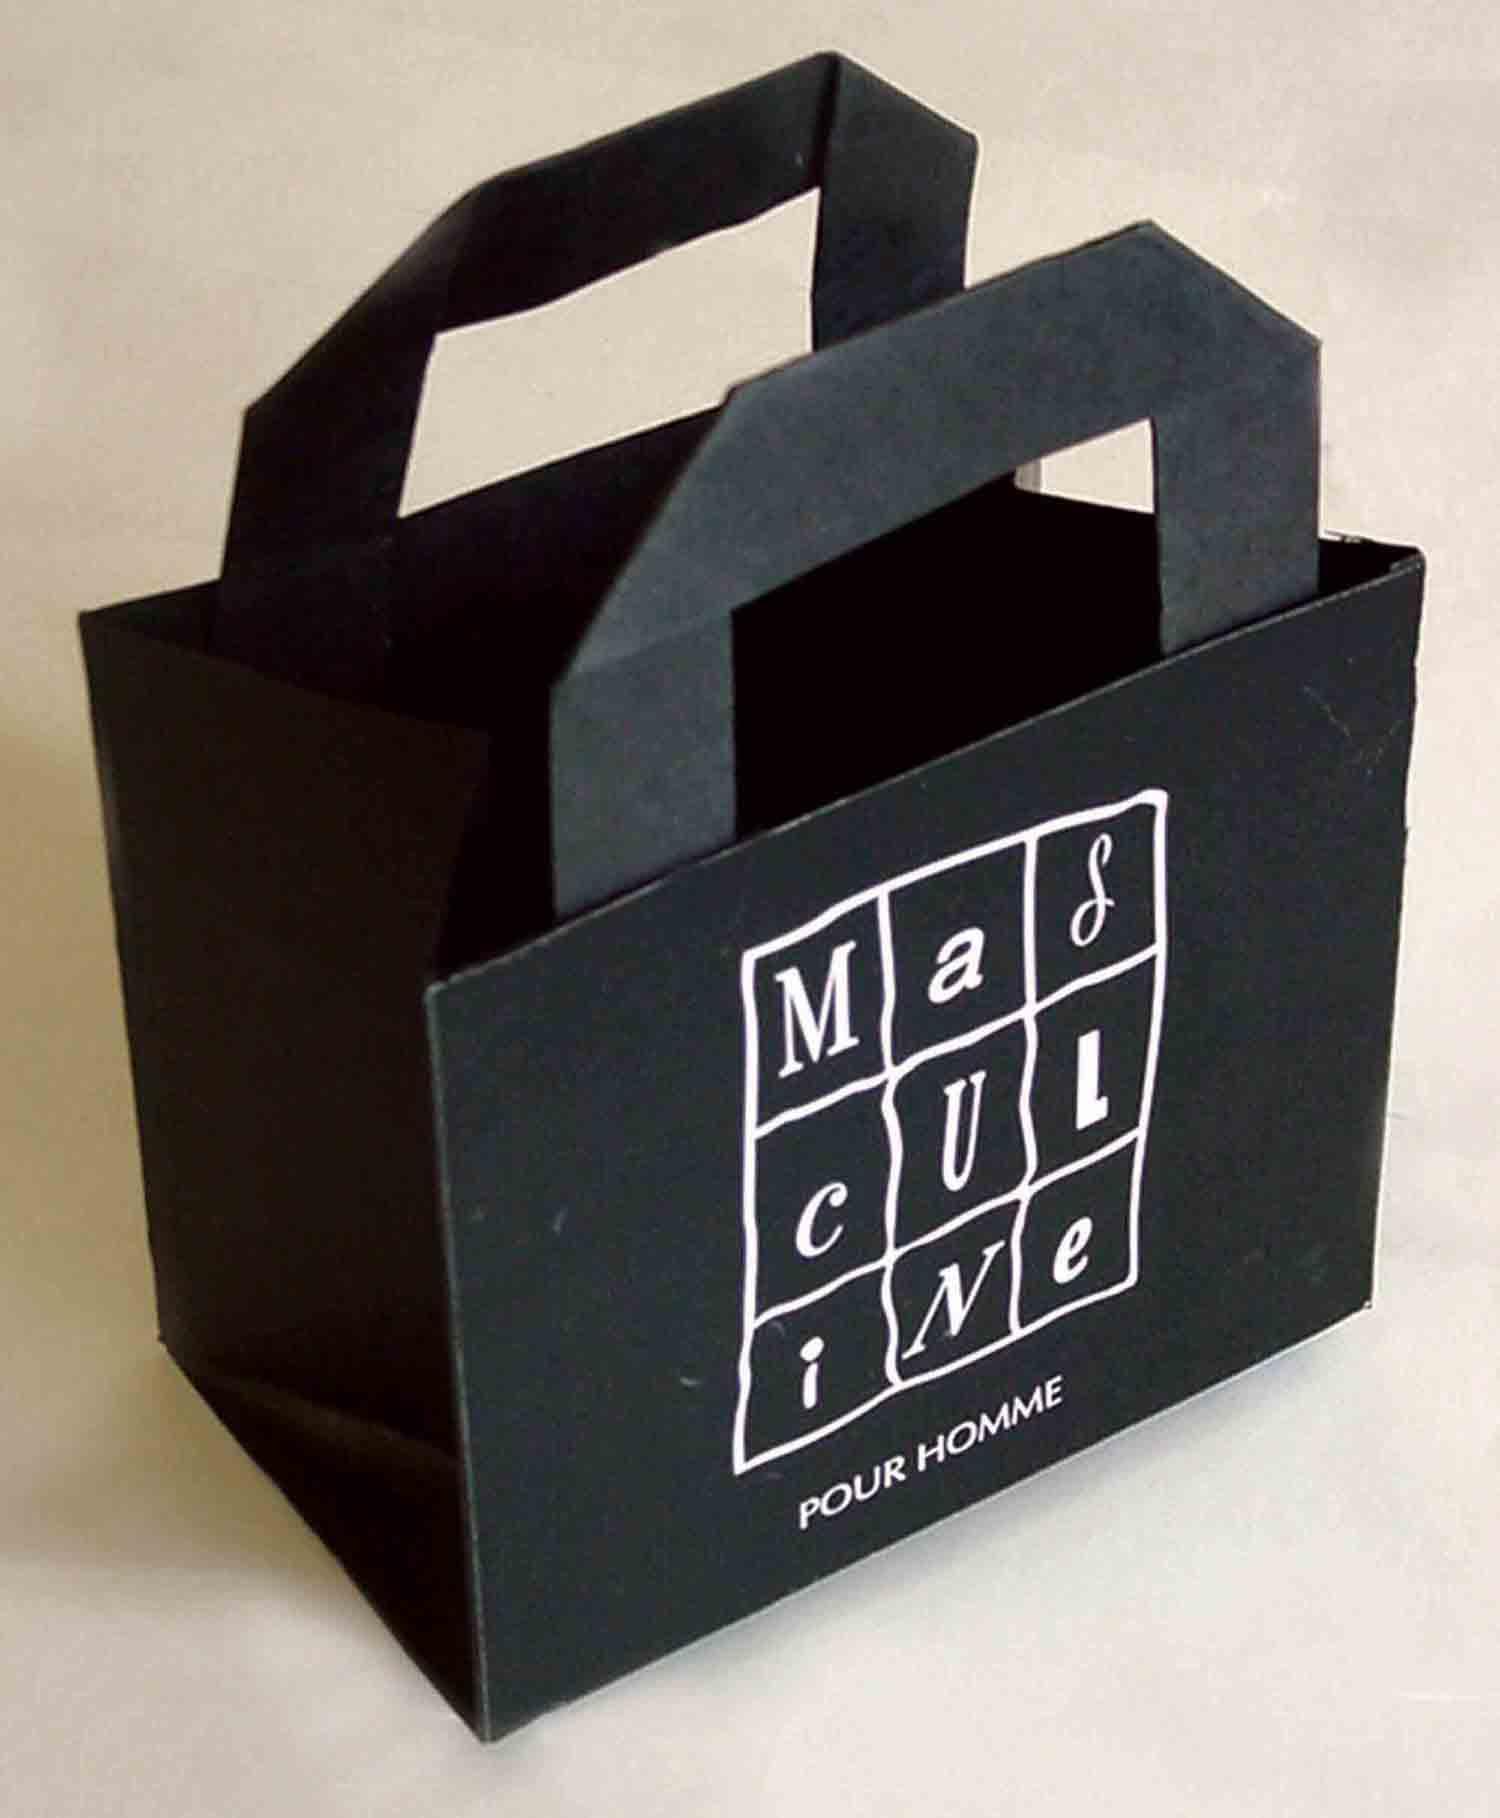 Masculine bag